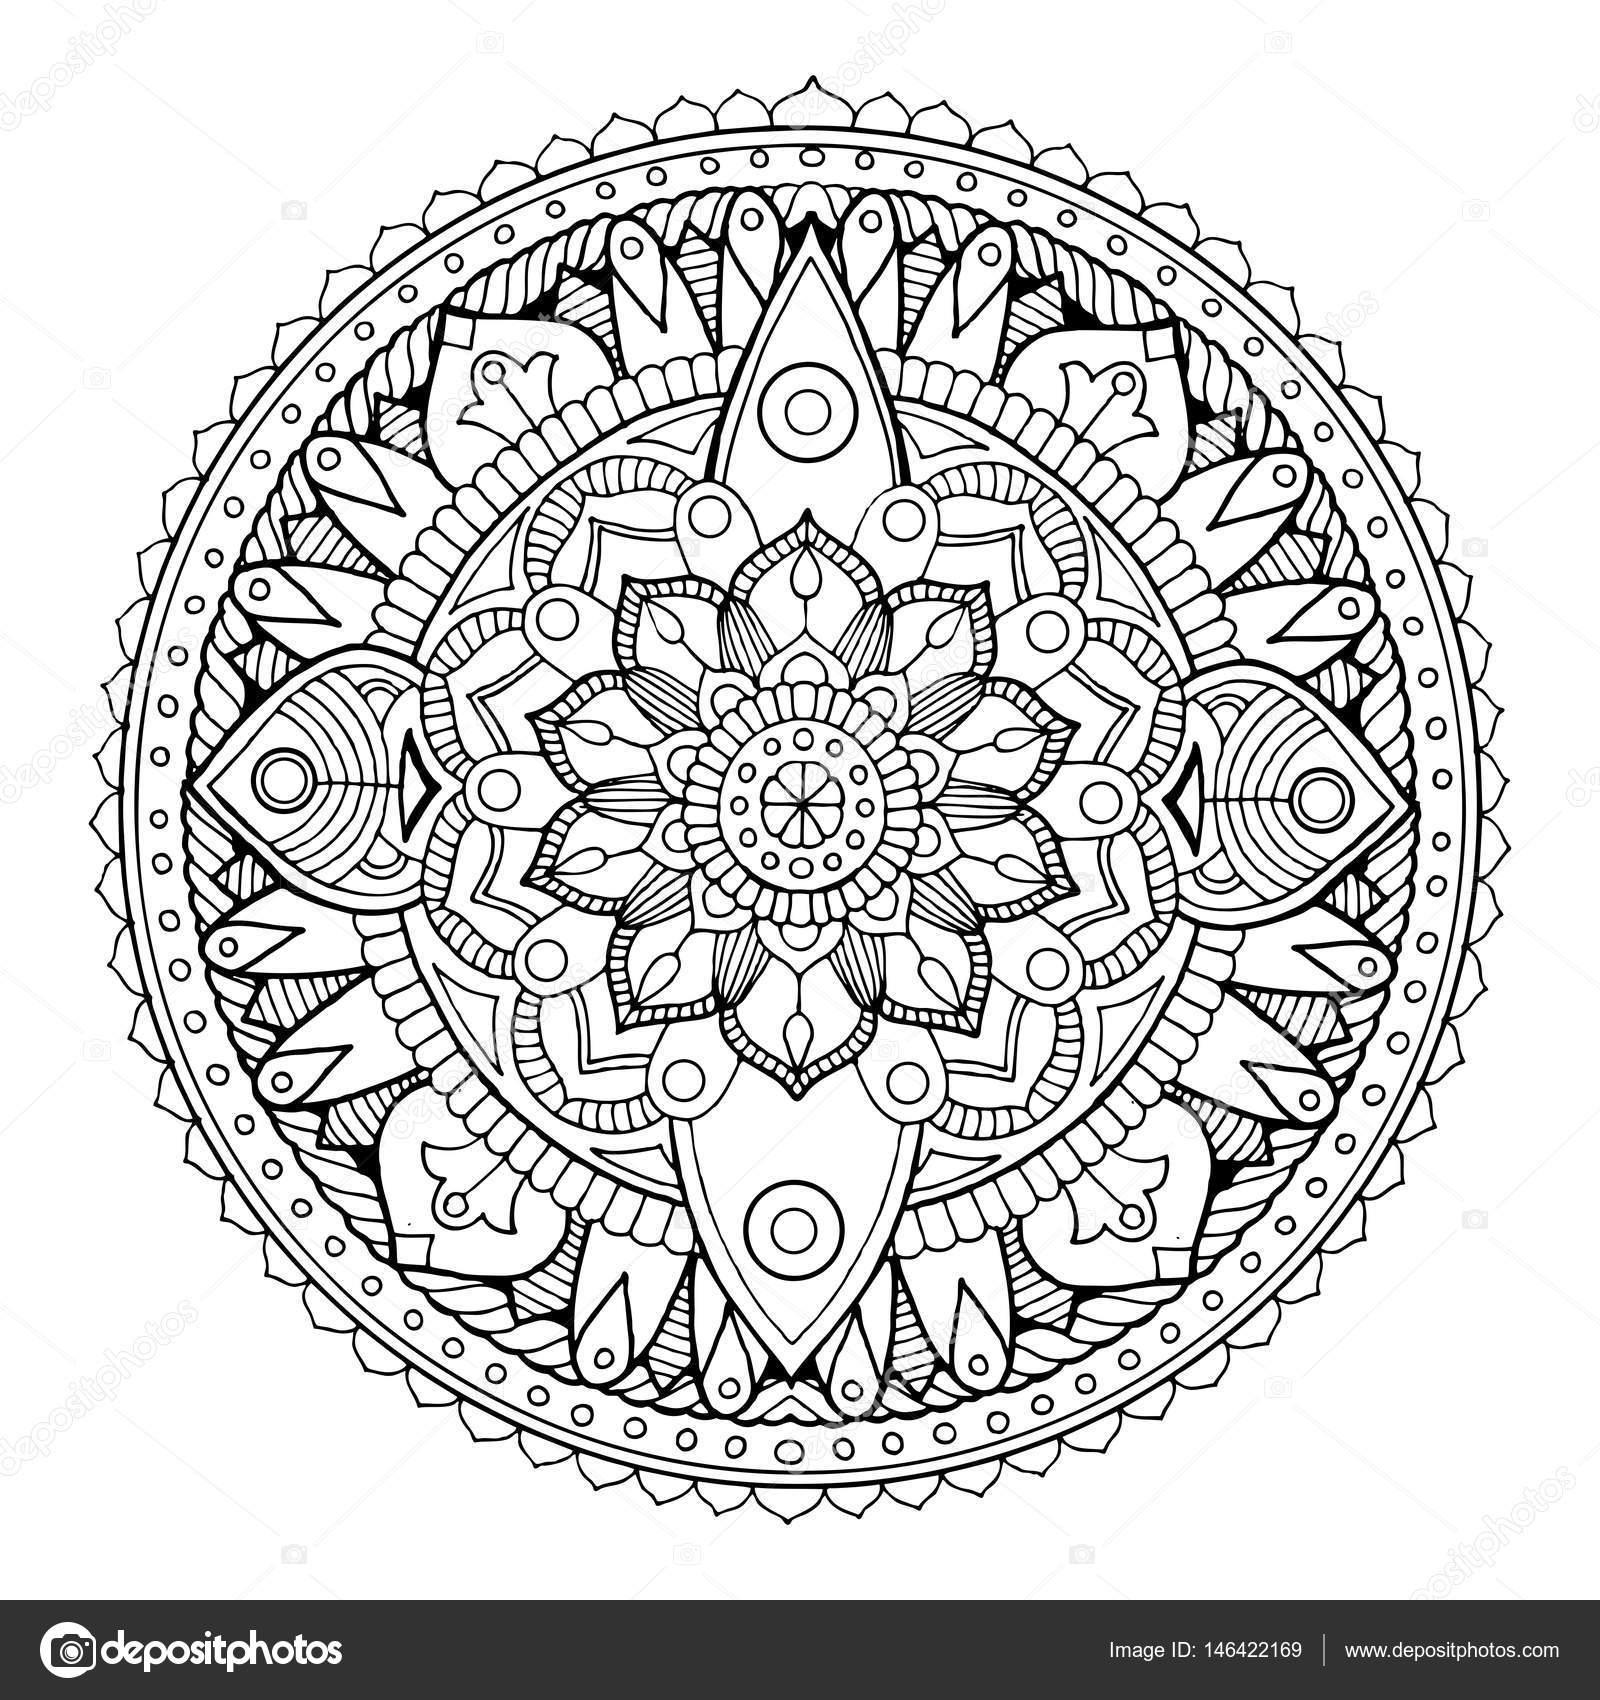 Mandala Kleurplaten Boek.Mandala Kleurplaat Boek Vectorillustratie Stockvector